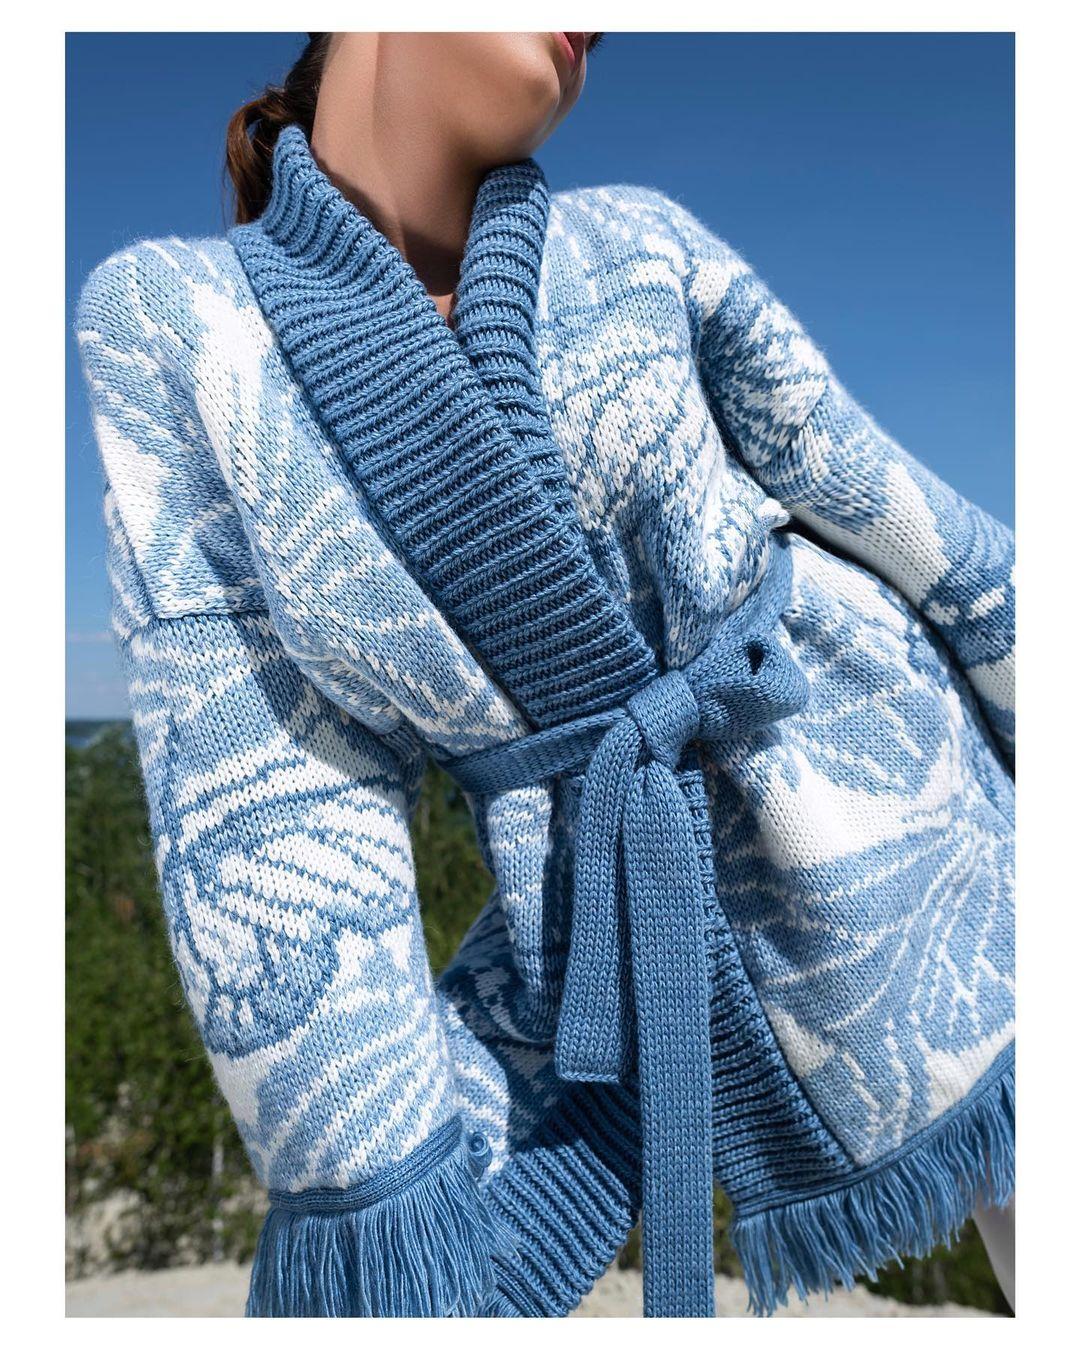 модный кардиган осень зима 2021 украинский бренд белый голубой принт бахрома теплый